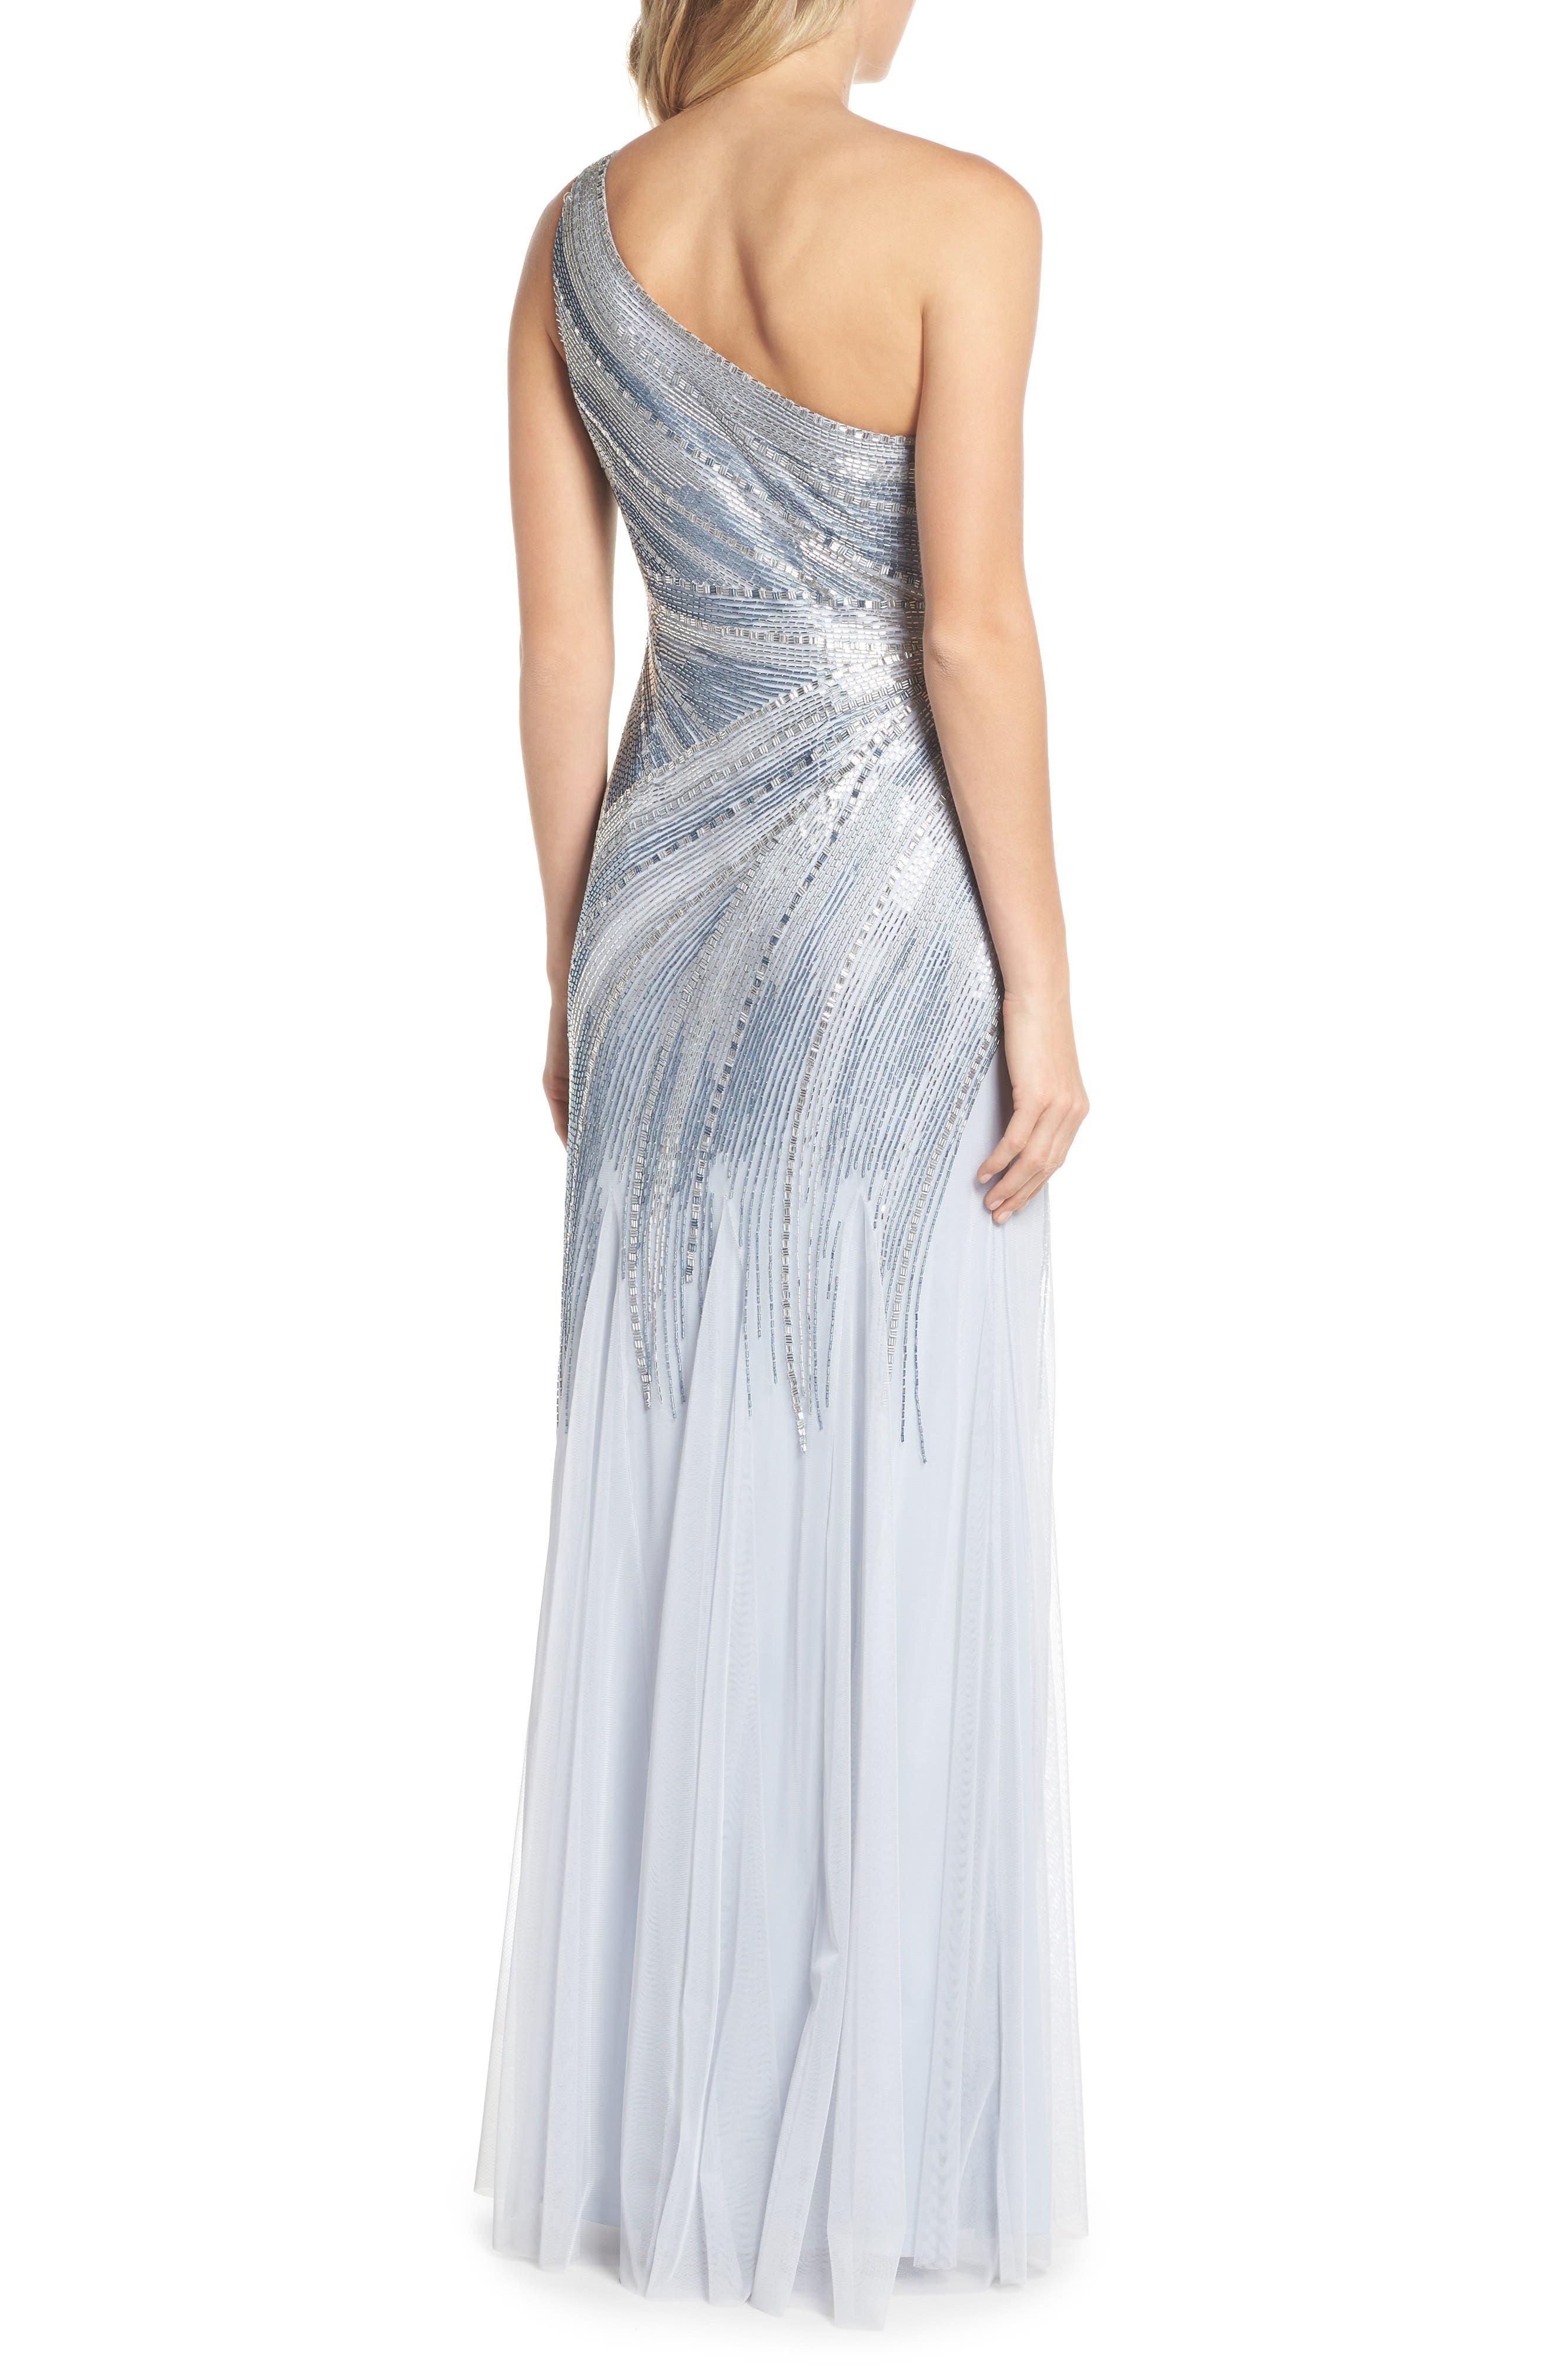 Beaded One-Shoulder Mermaid Gown,                             Alternate thumbnail 2, color,                             450